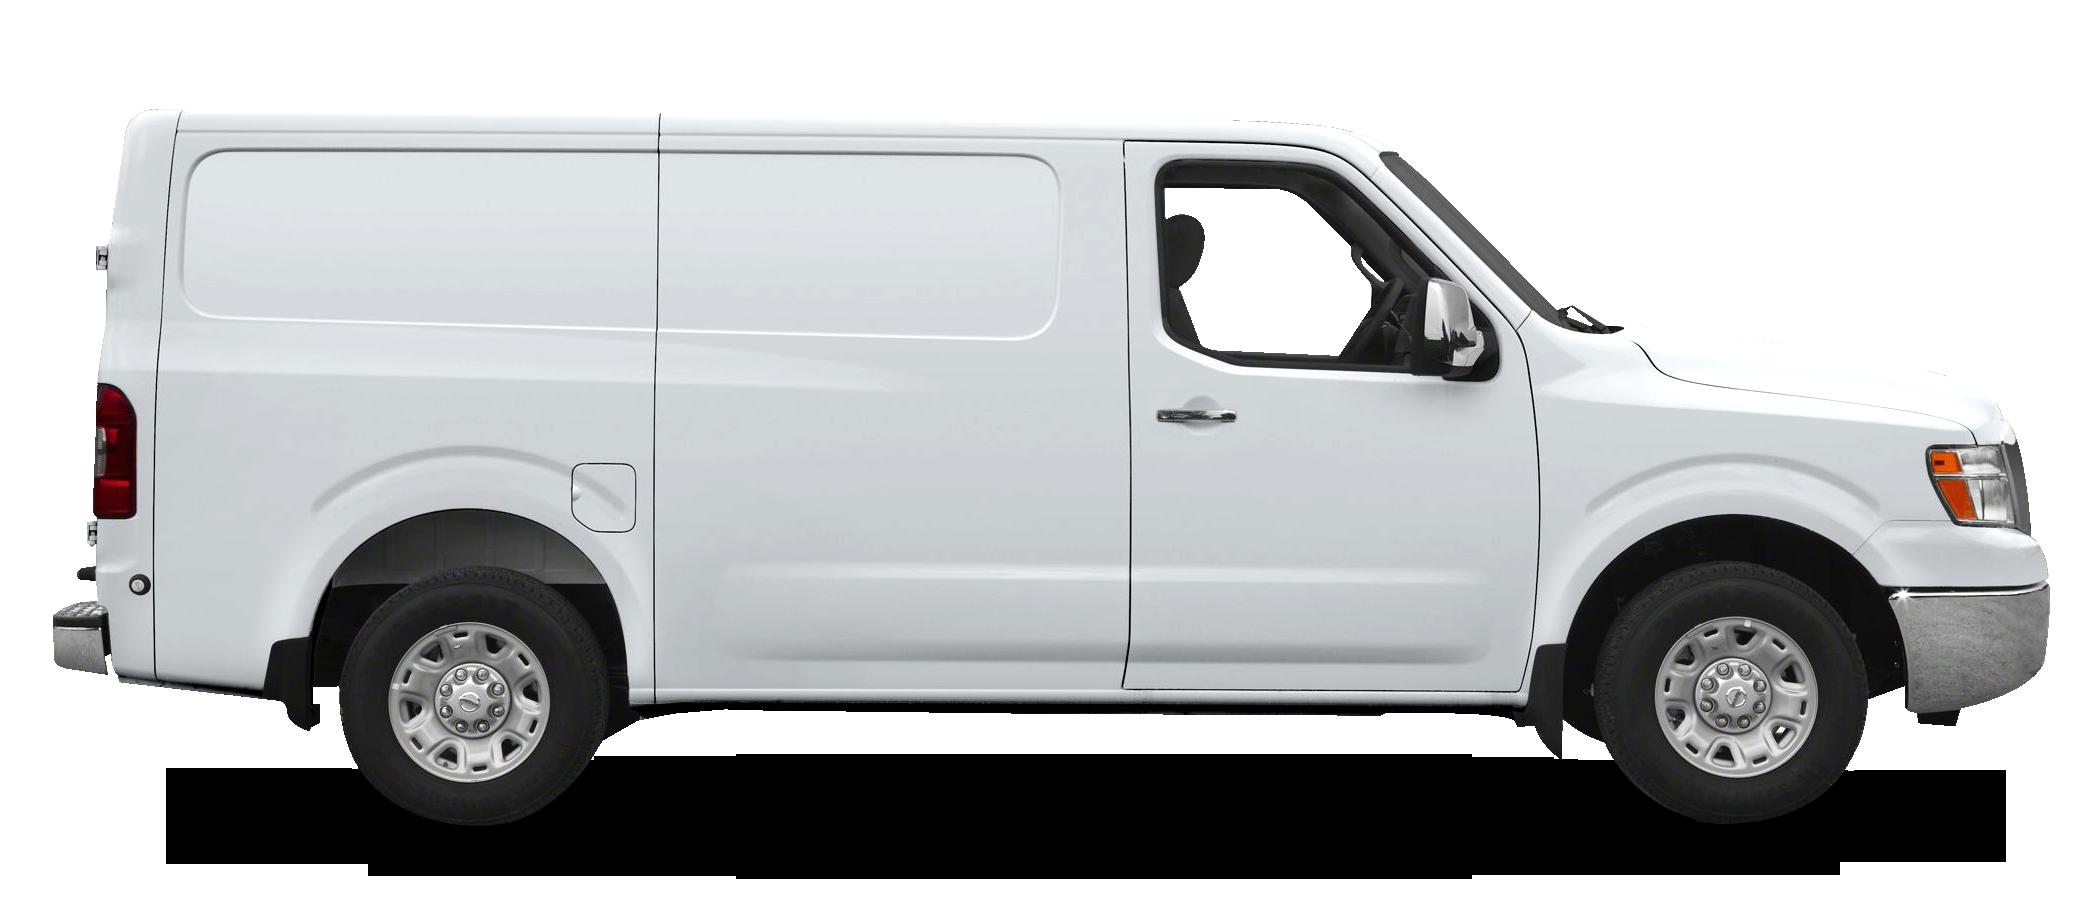 Delivery Van Png Image Van Png Images Png